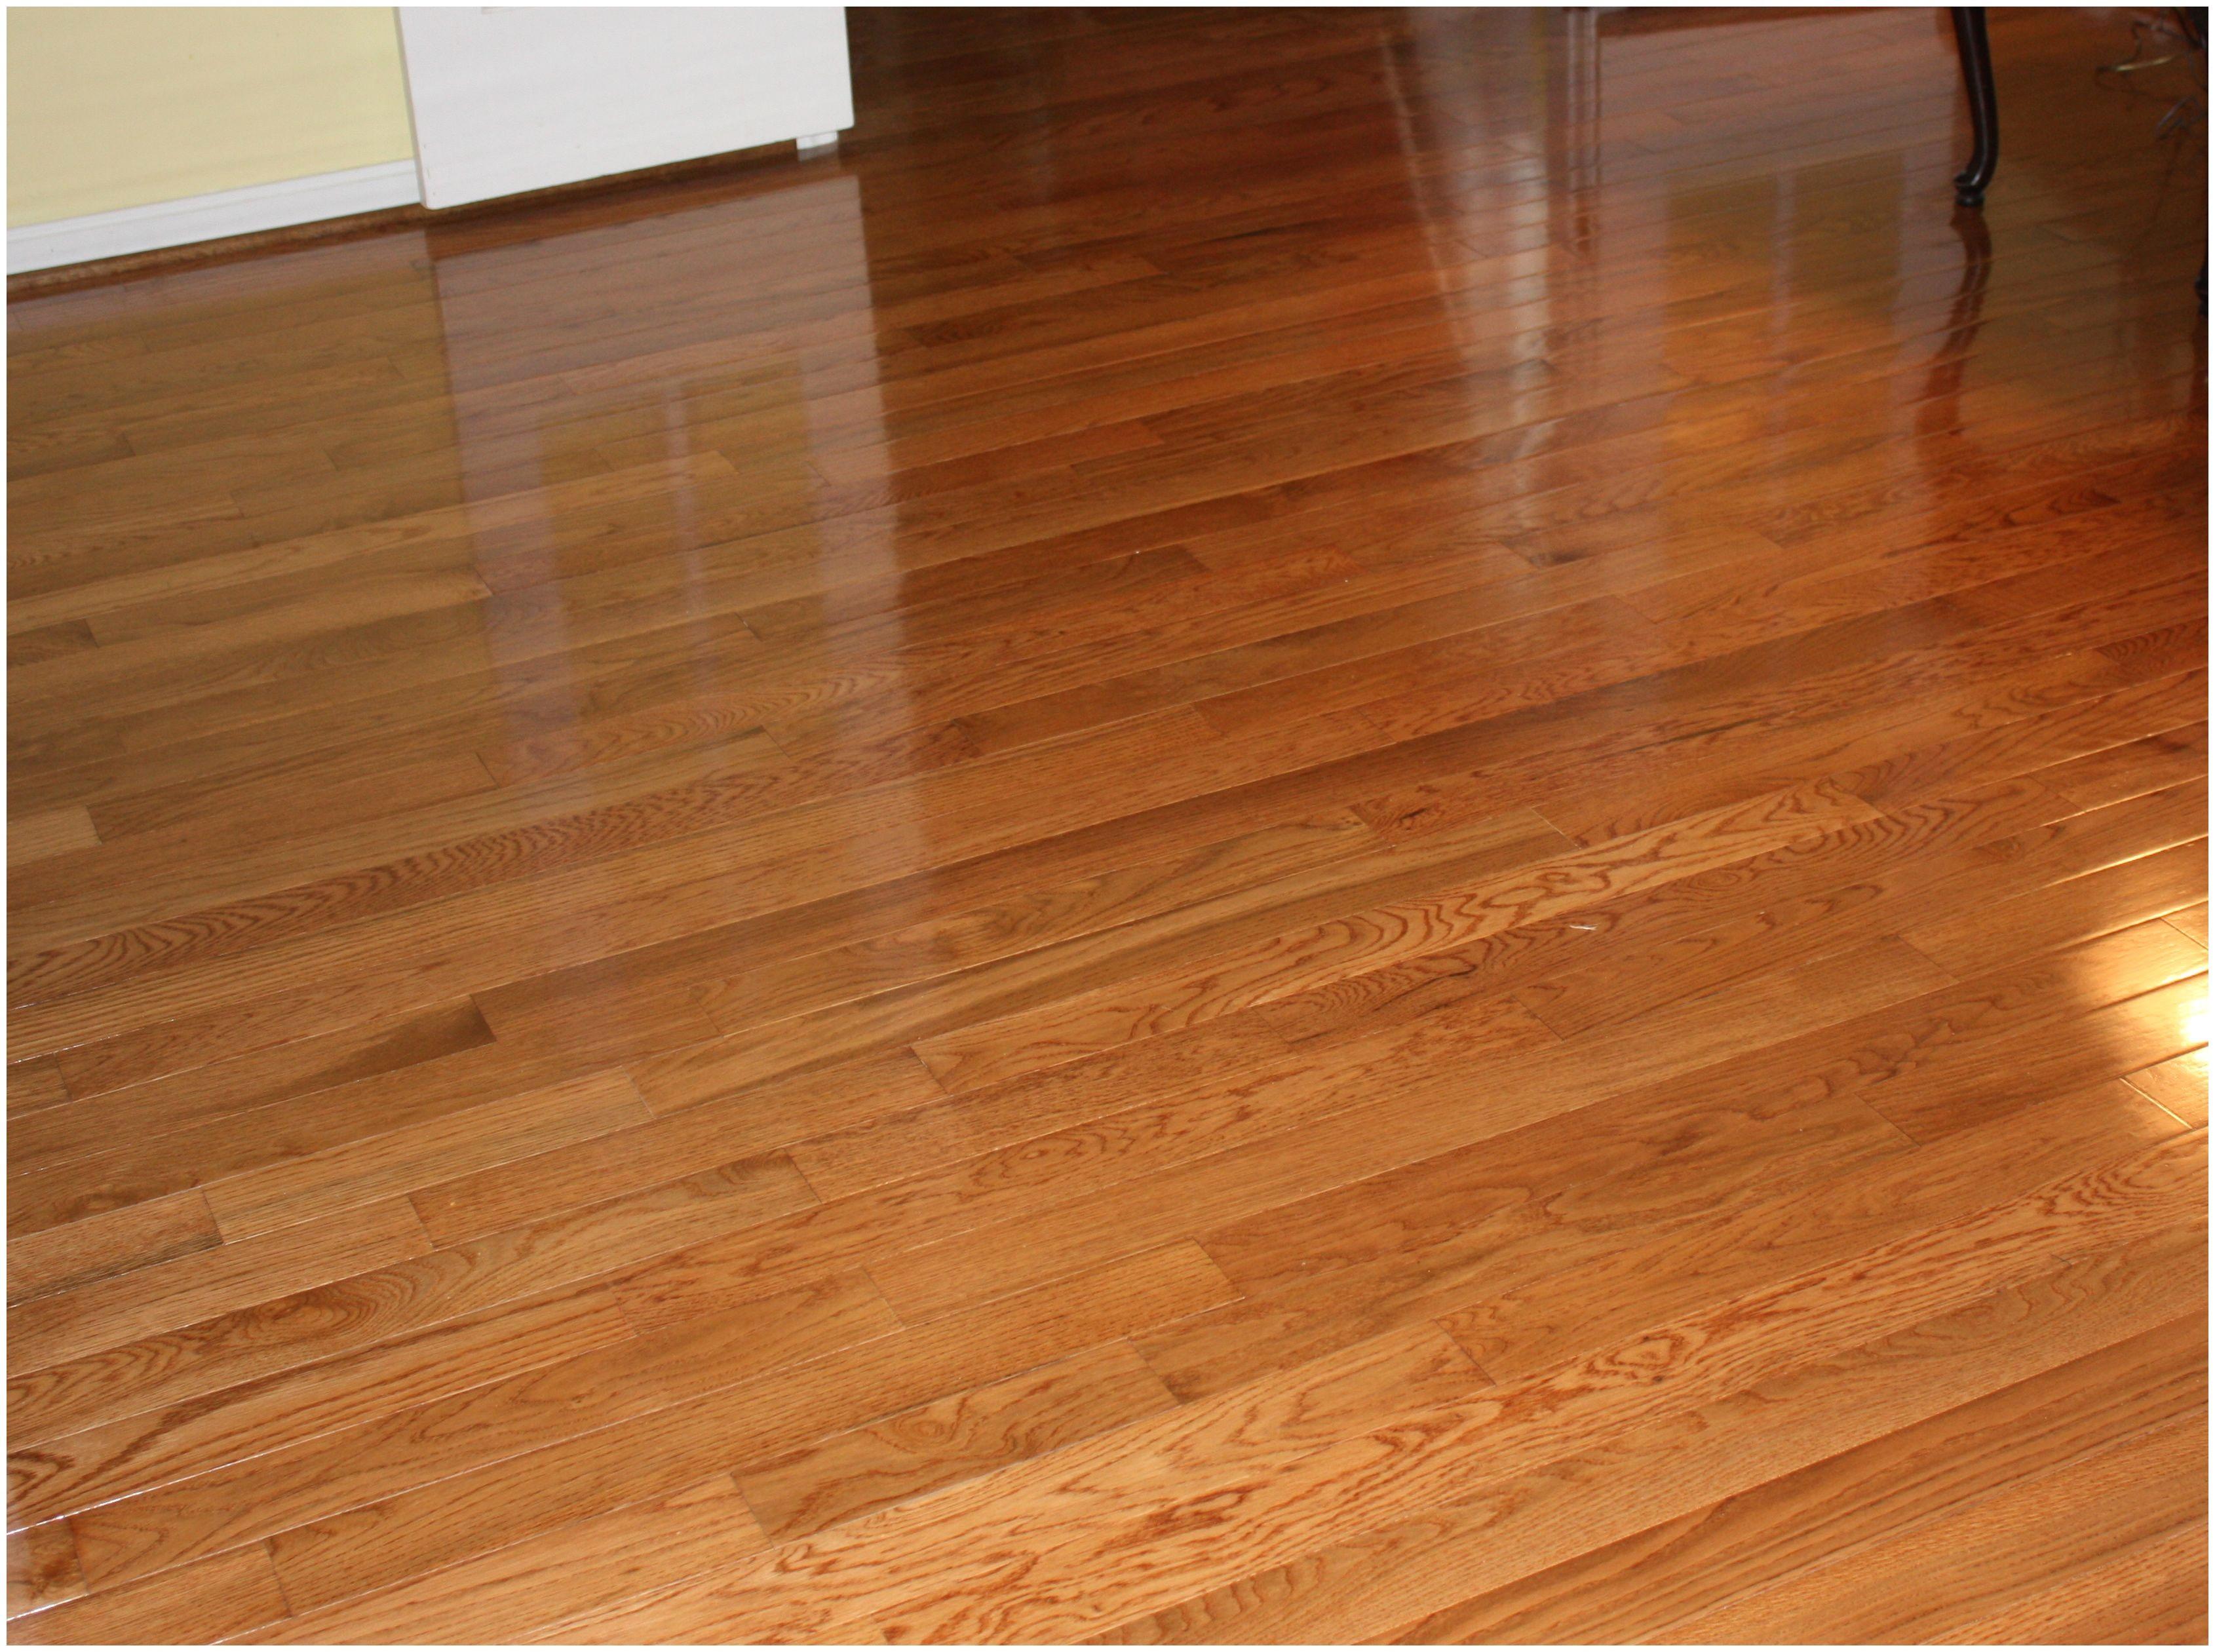 oak hardwood flooring denver of 18 new engineered hardwood flooring pros and cons photos dizpos com in engineered hardwood flooring pros and cons awesome hardwood floor design cheap laminate flooring laminate wood collection